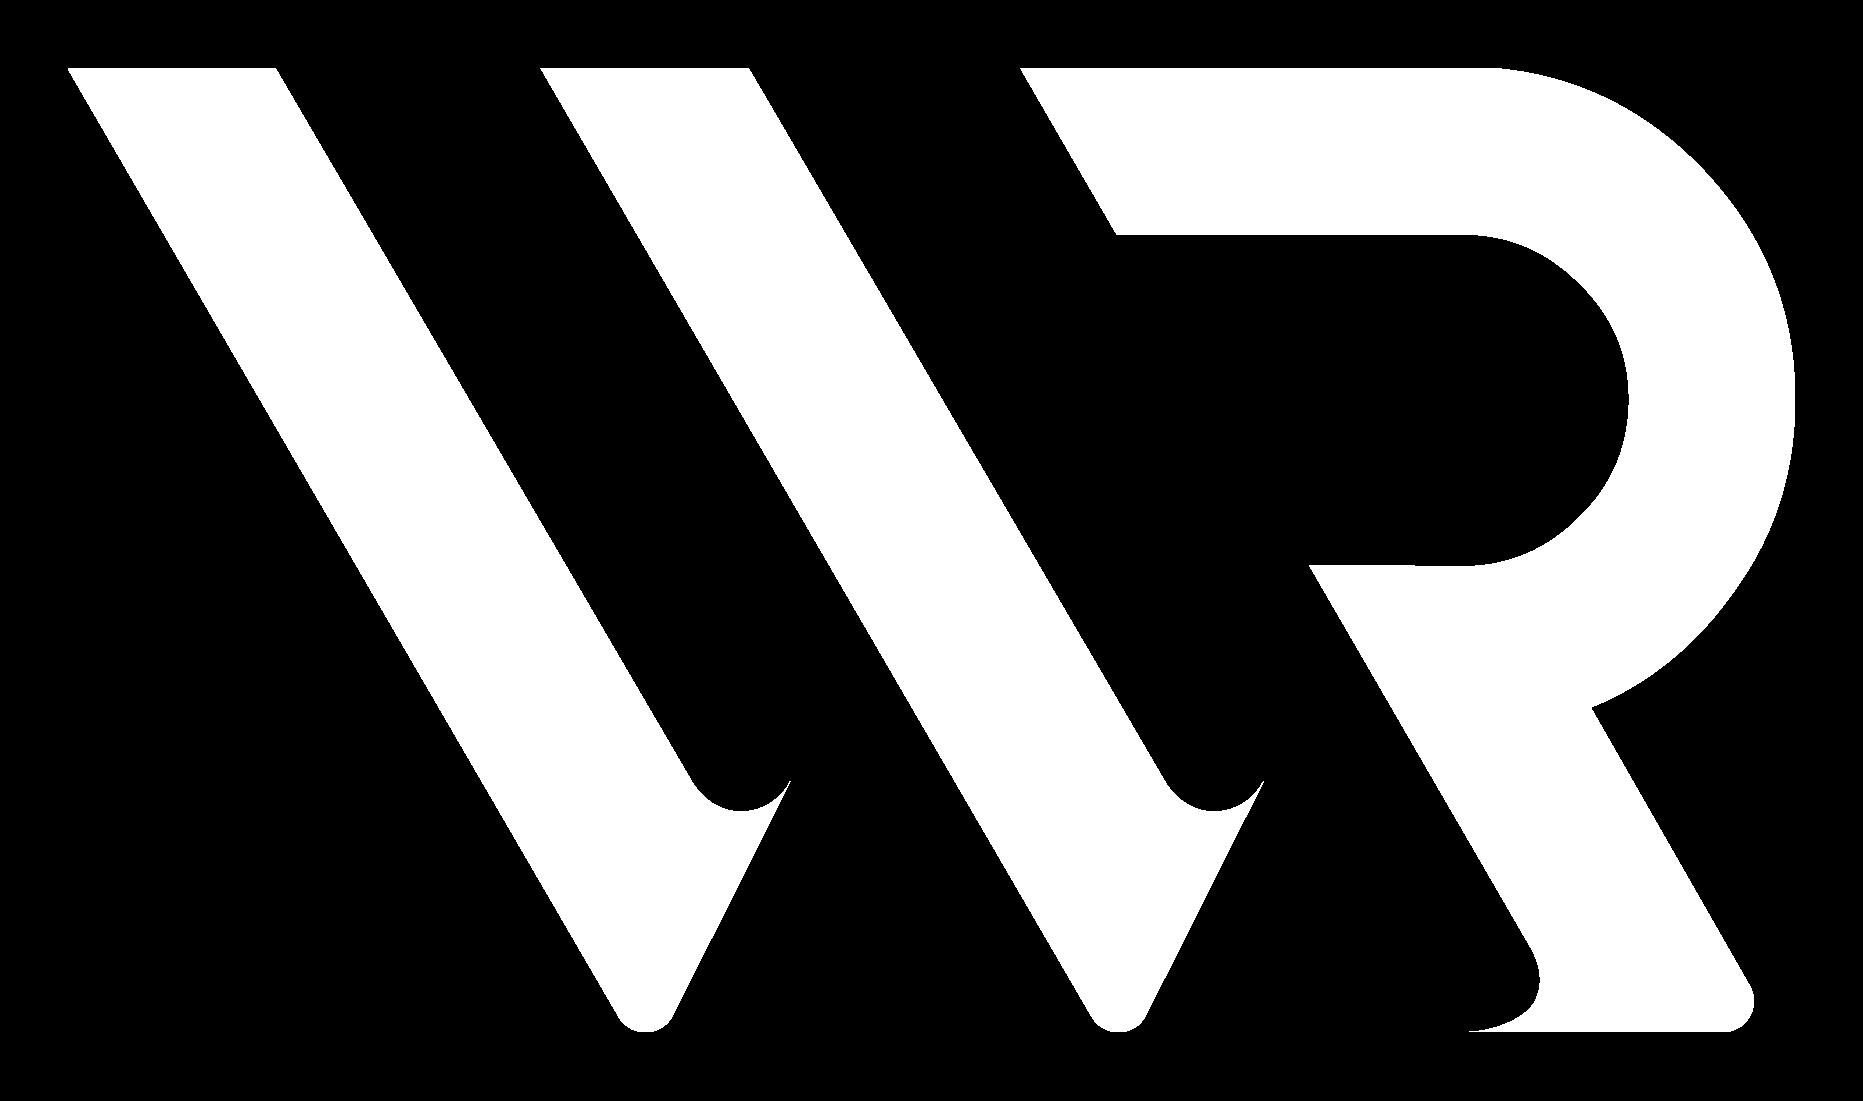 VVR | De Permentier Travel - Reisbureau Hasselt